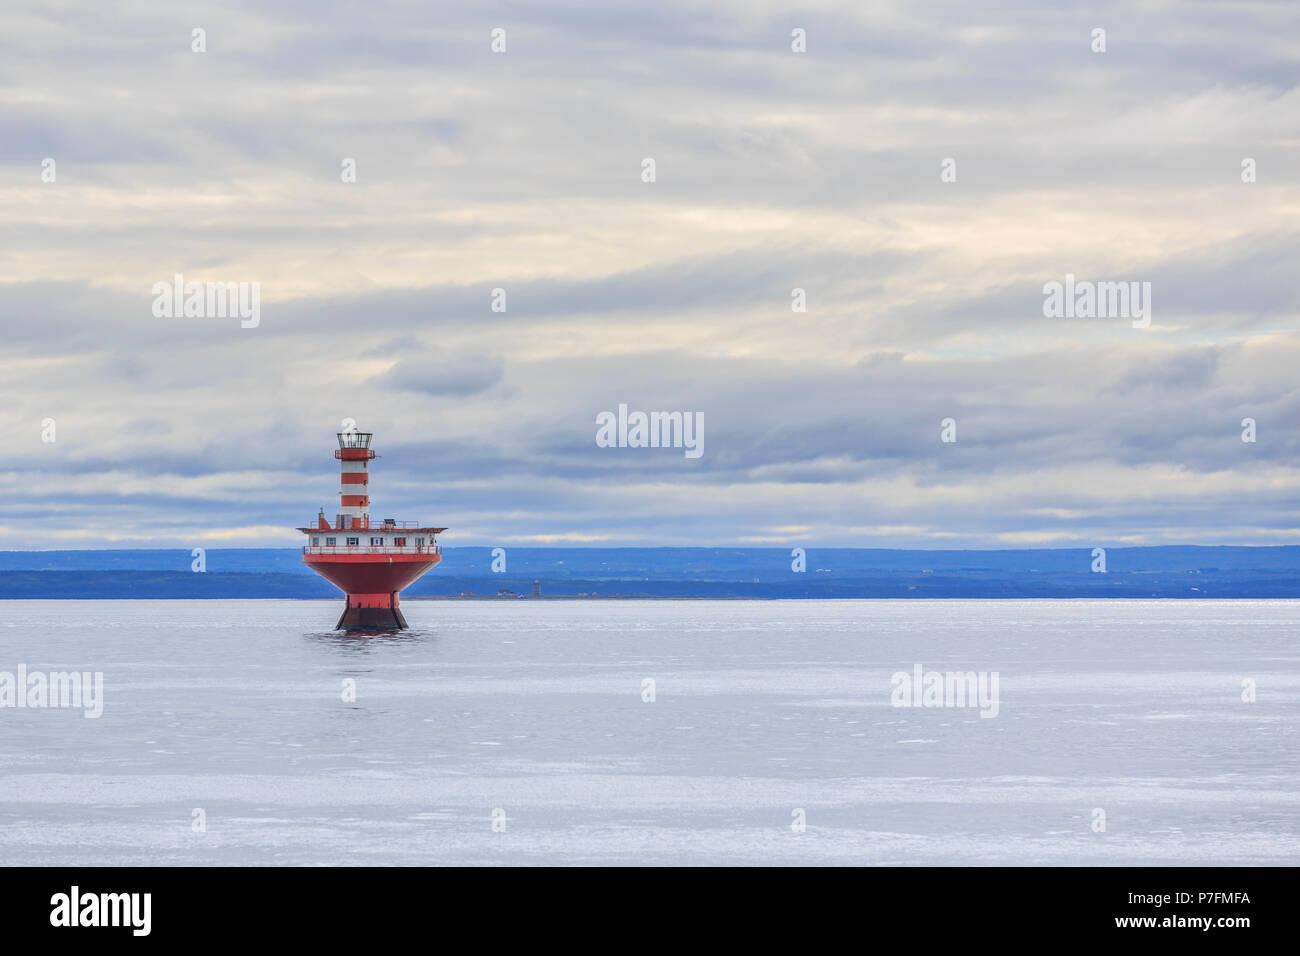 Lighthouse Phare du Haut-Fond Prince in Saint Lawrence River, Tadoussac, Québec Province, Canada - Stock Image